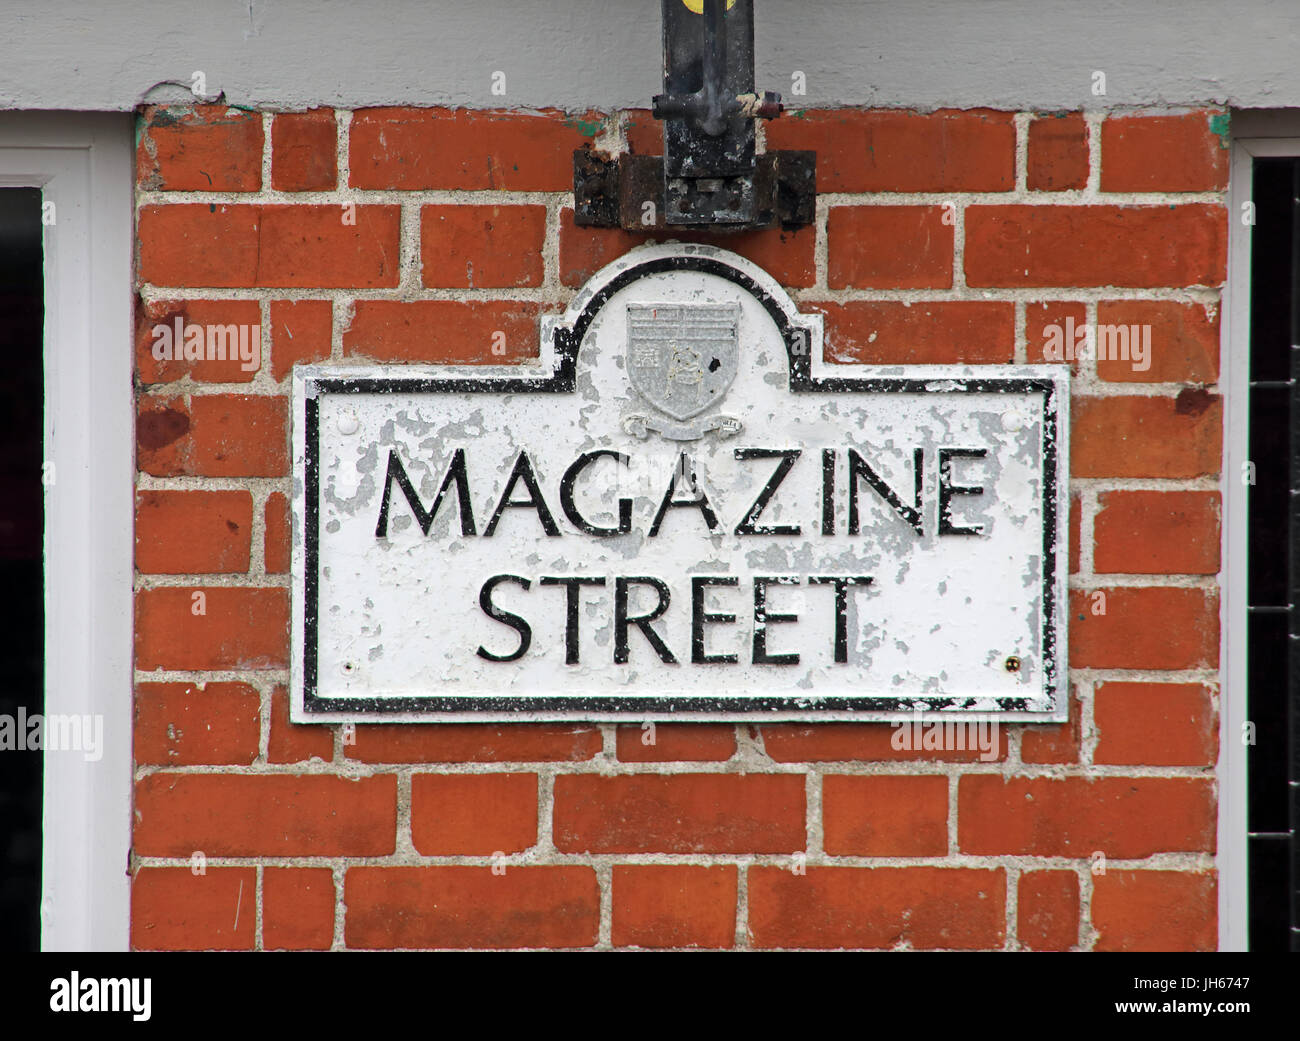 Irish,Bogside,Troubles,Political,NorthernIreland,tourist,Tourism,Struggle,DerryCity,Peace,Art,Culture,violence,fighter,painting,Magazine